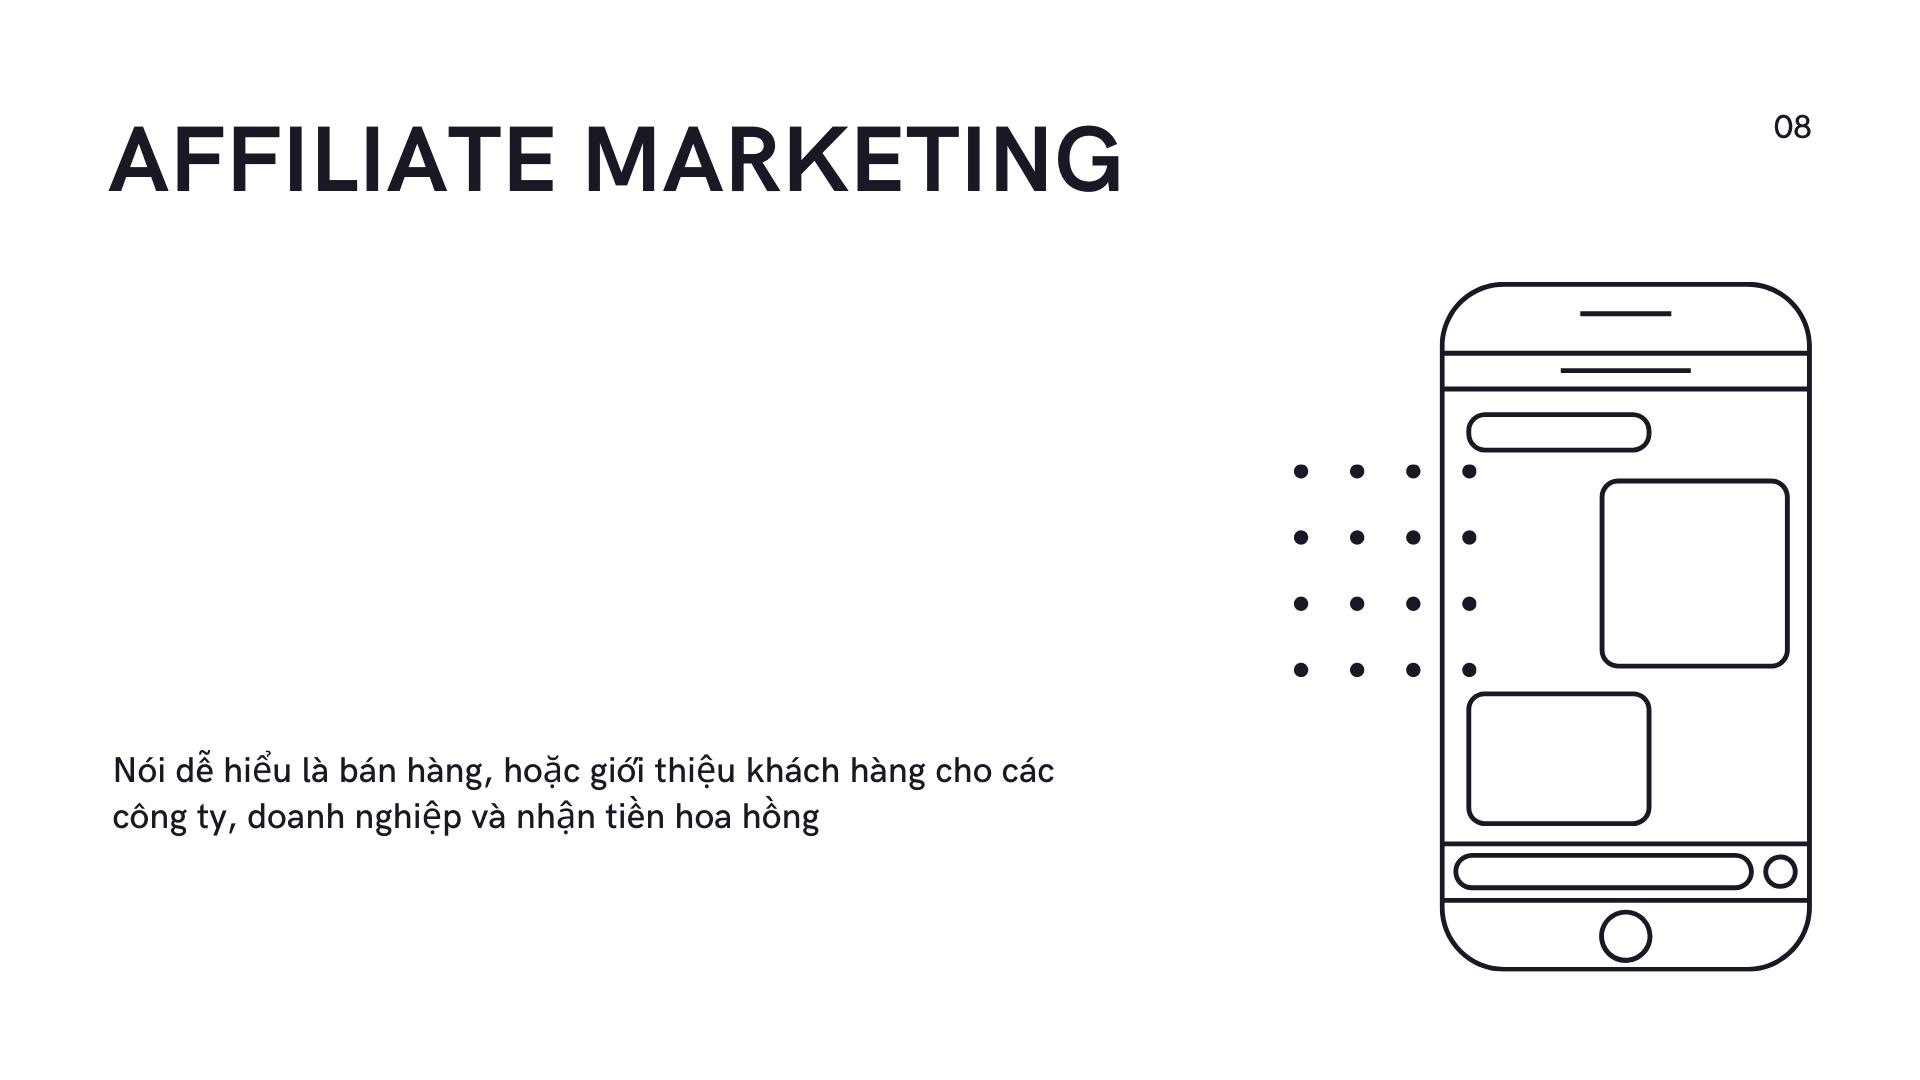 kiem-tien-online-bang-affiliate-marketing